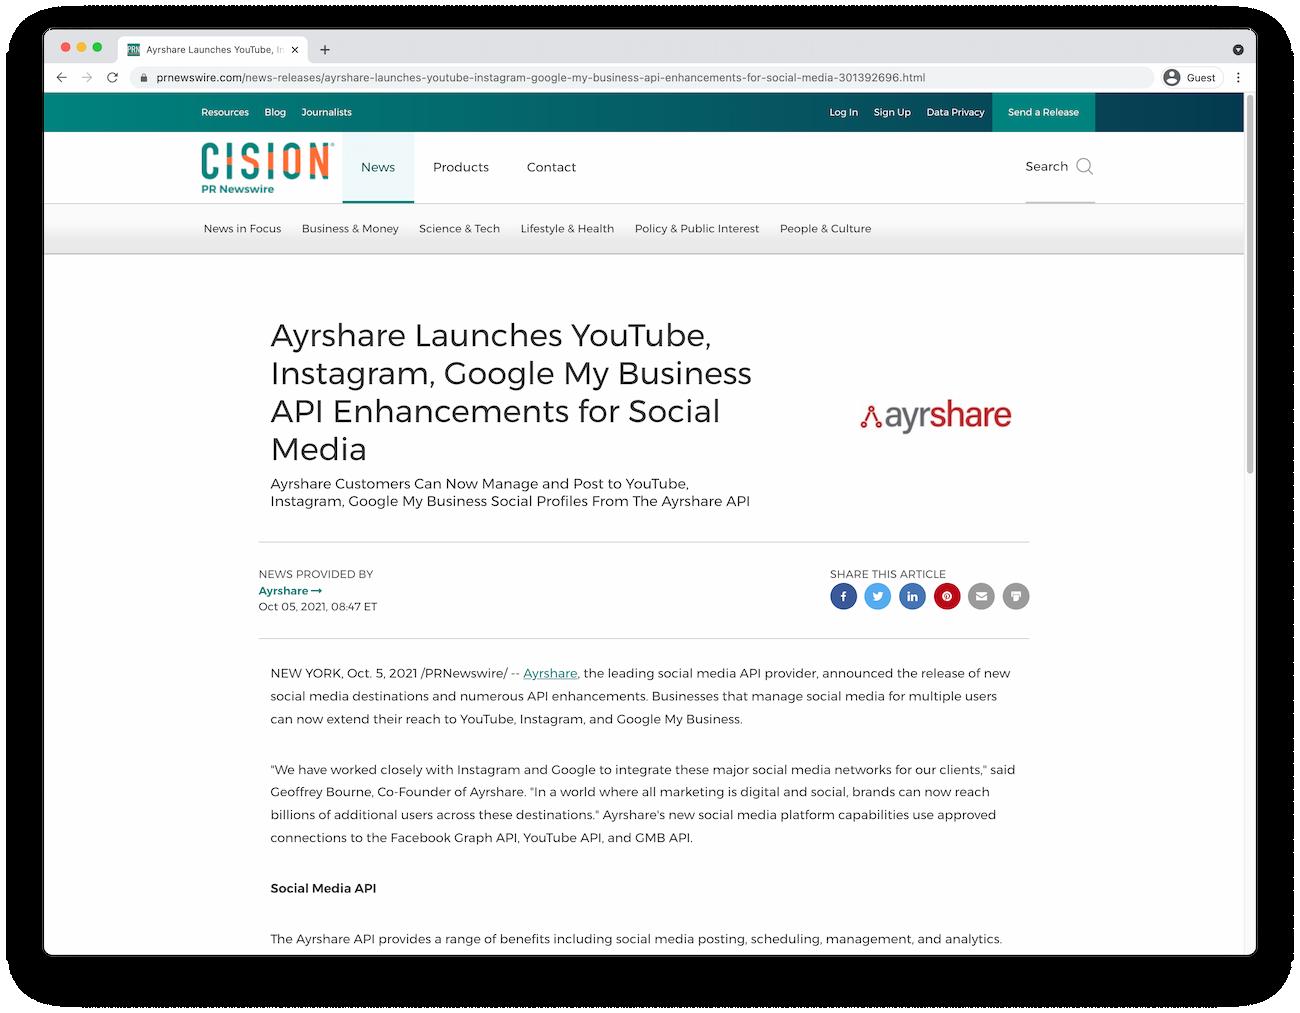 Ayrshare Press Release